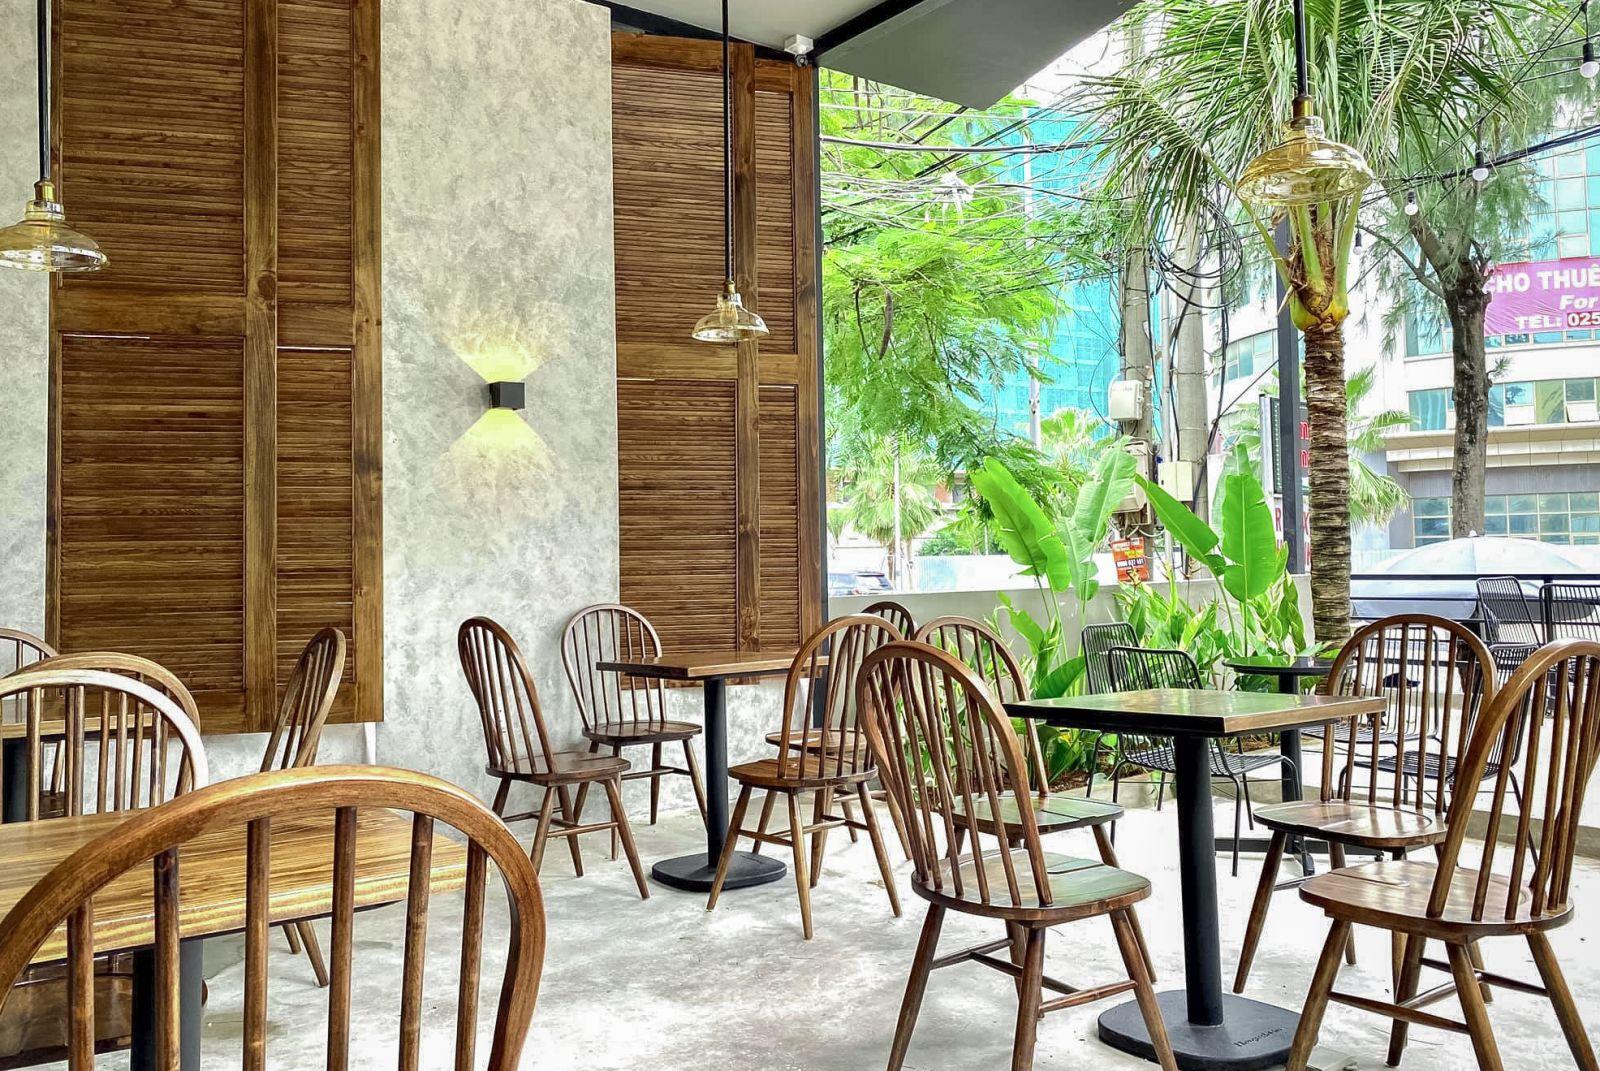 thi-cong-quan-cafe-palma-the-garden-cafe-vung-tau-44